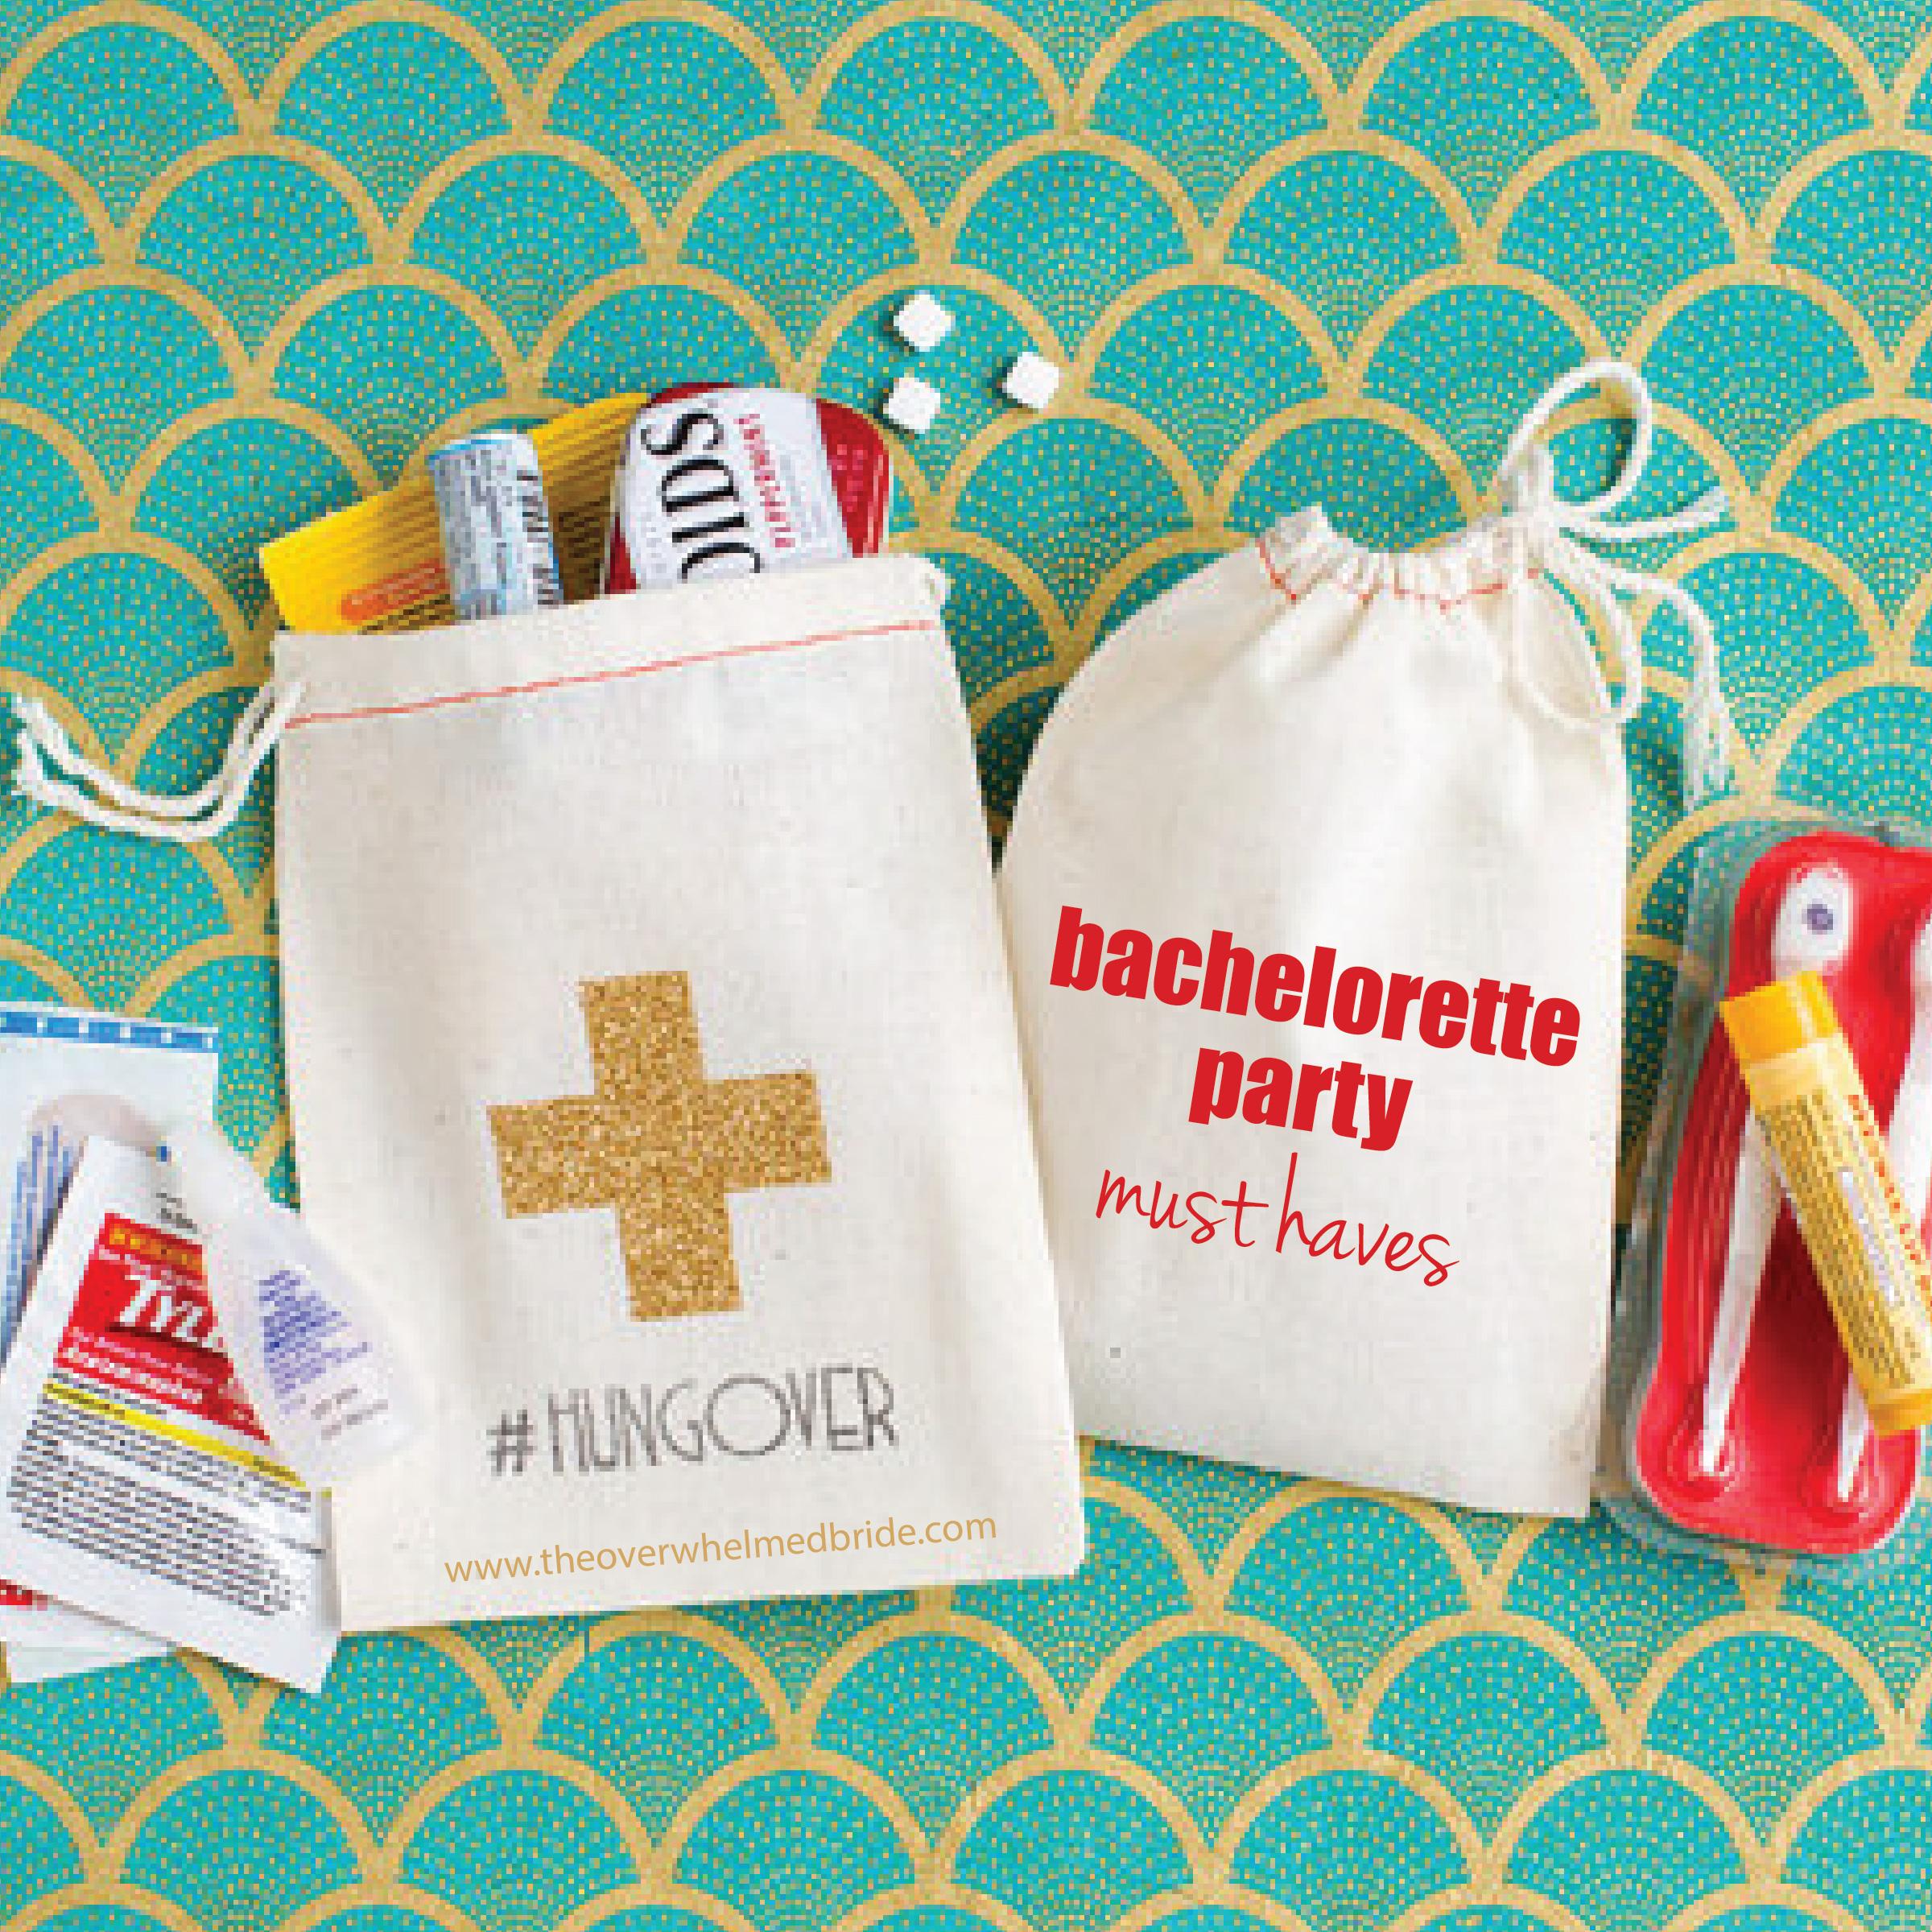 Fun Bachelorette Party Items + Decor